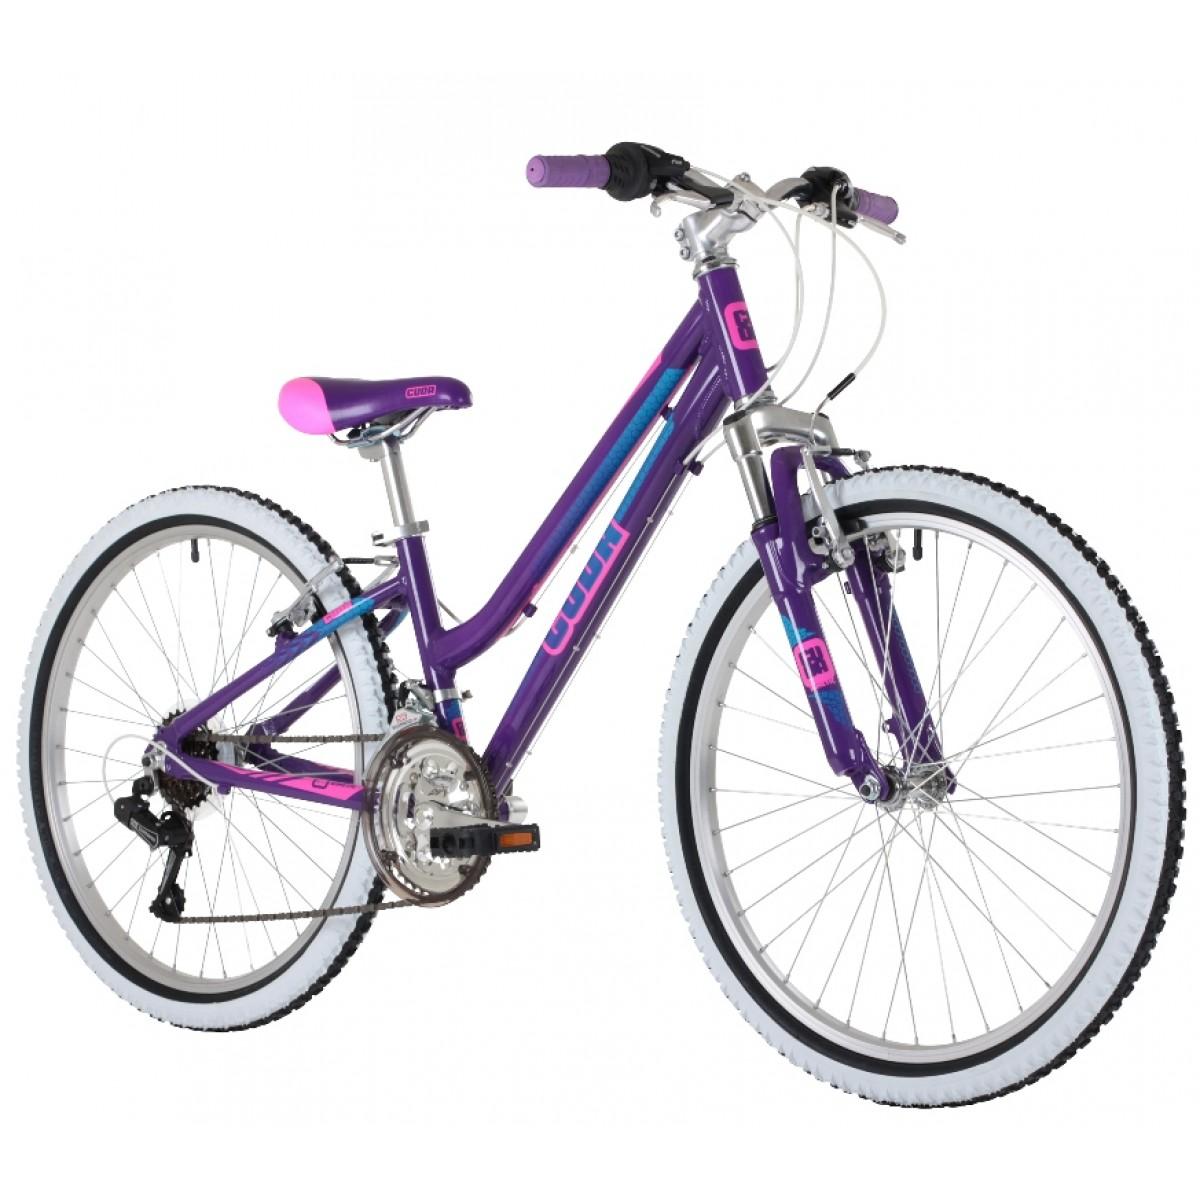 Cuda Kinetic 24 Inch Purple Alloy Mountain Bike